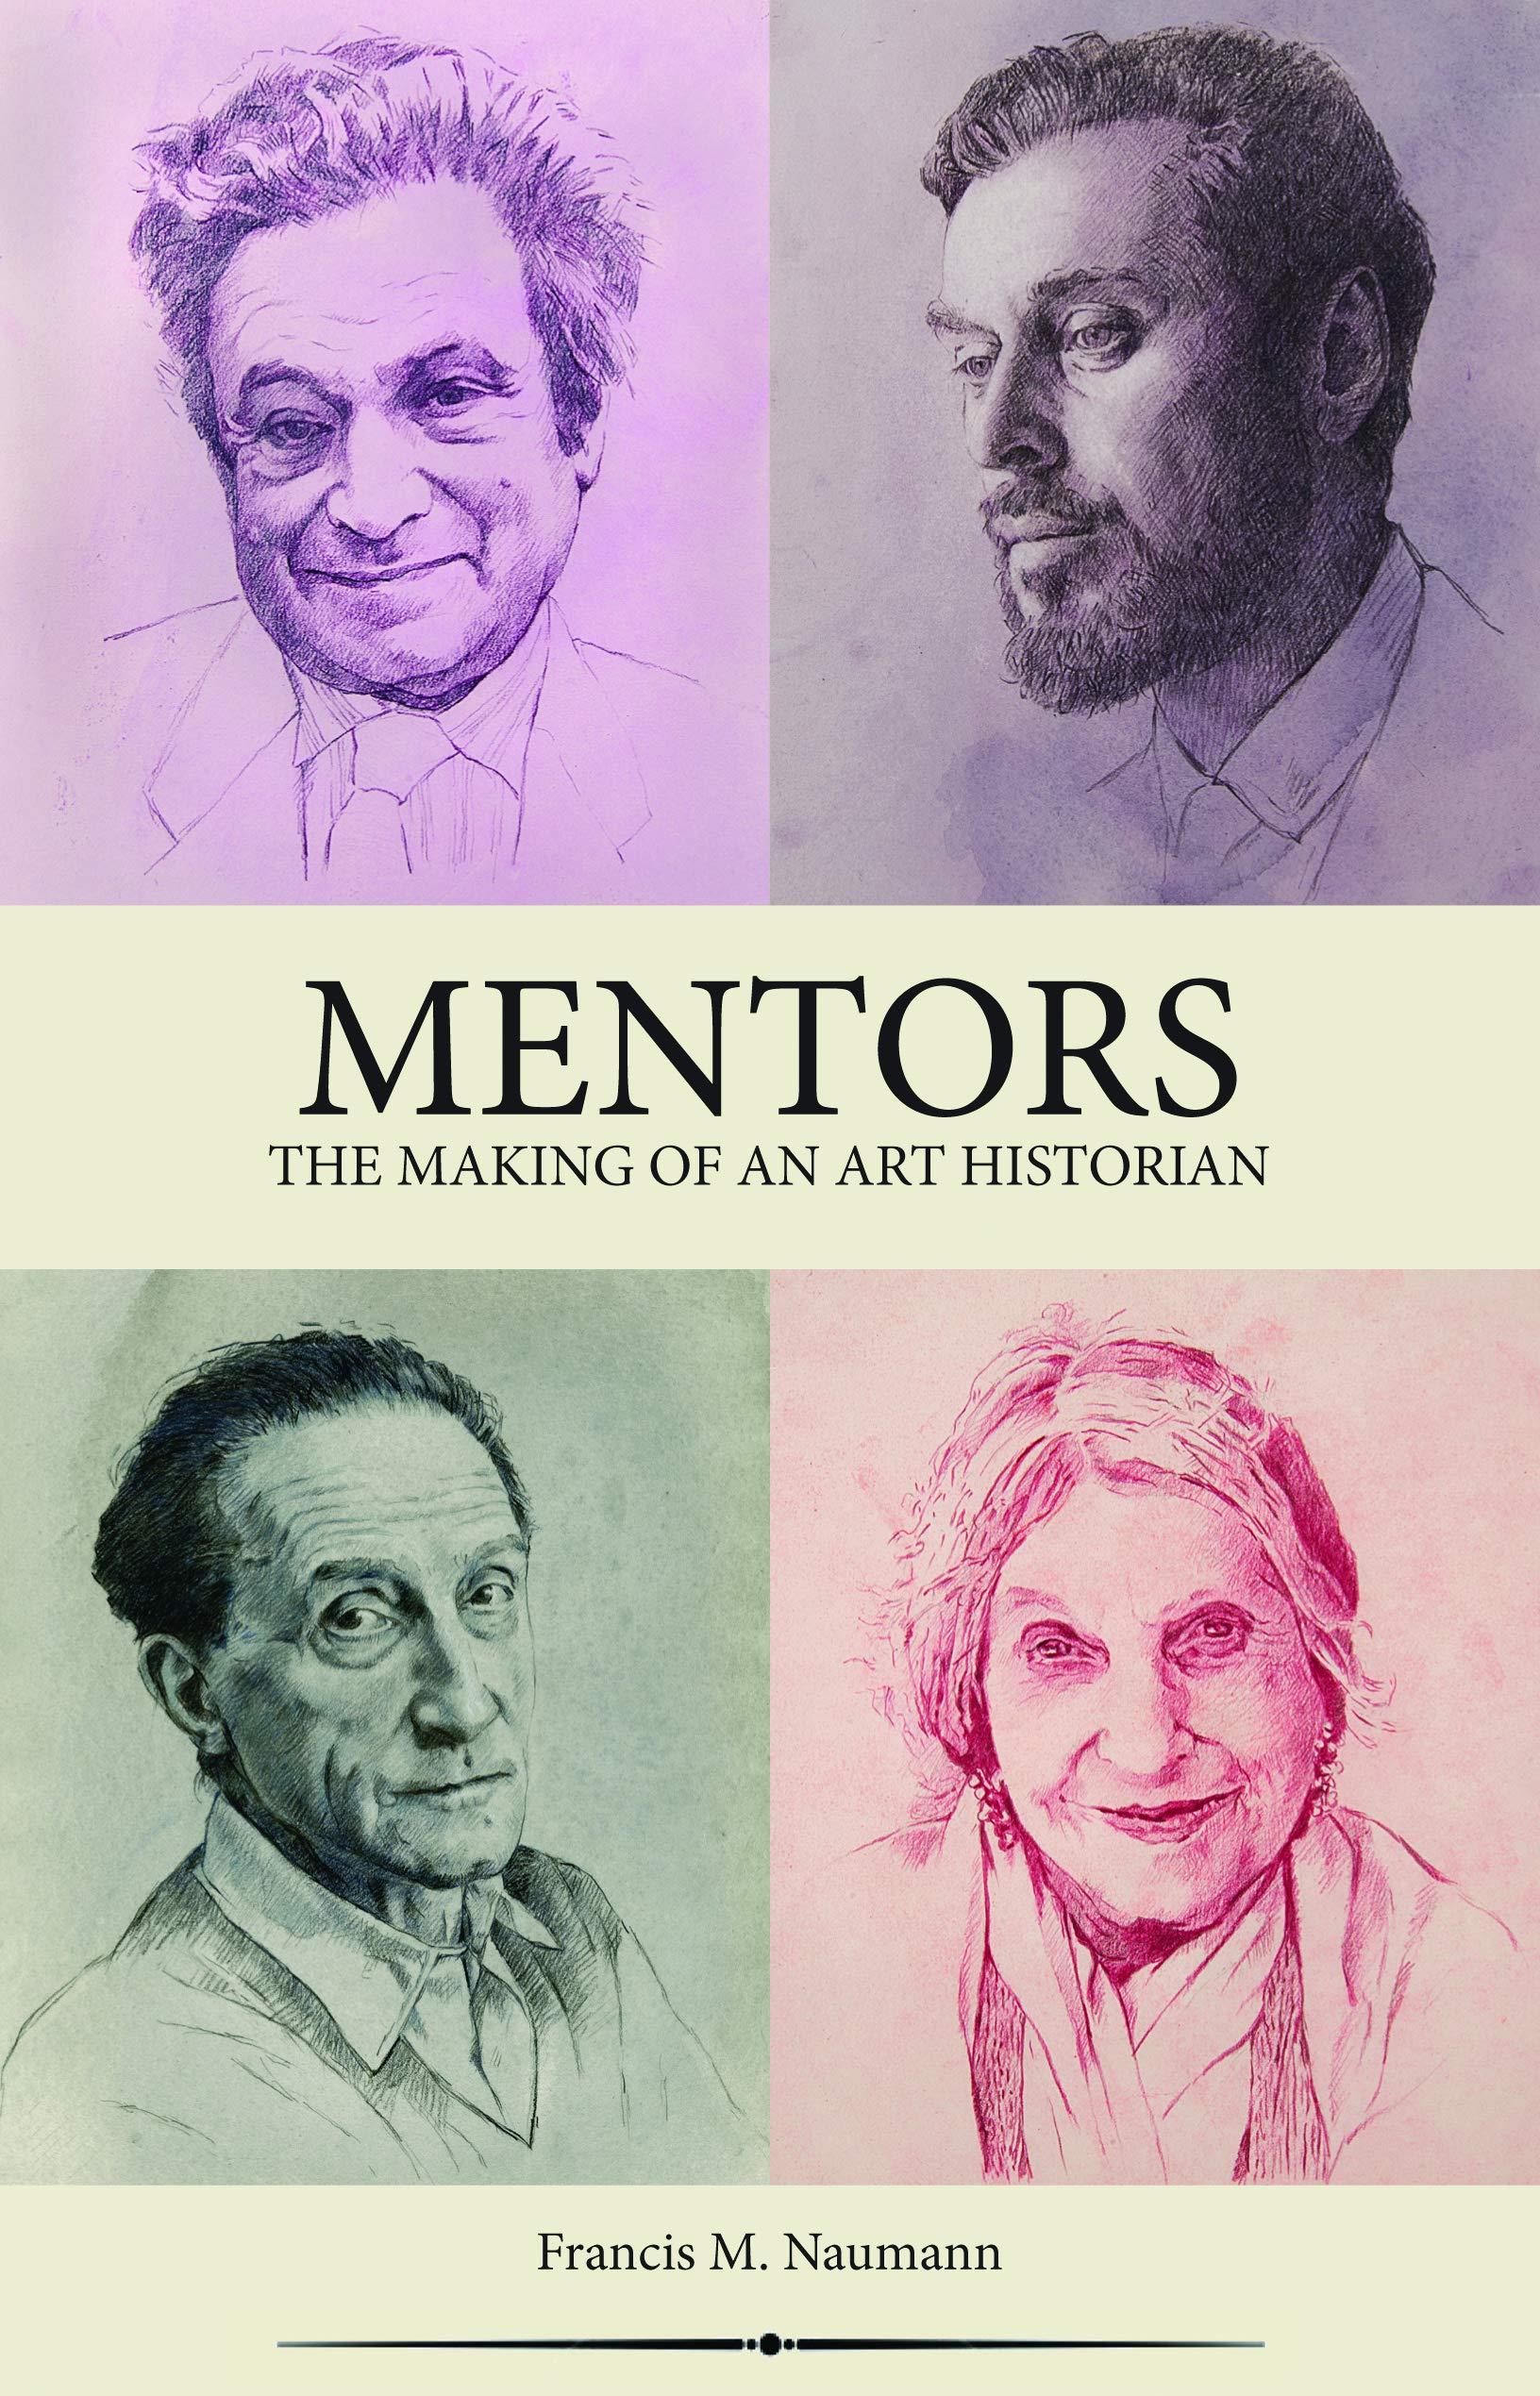 Mentors: The Making of an Art Historian